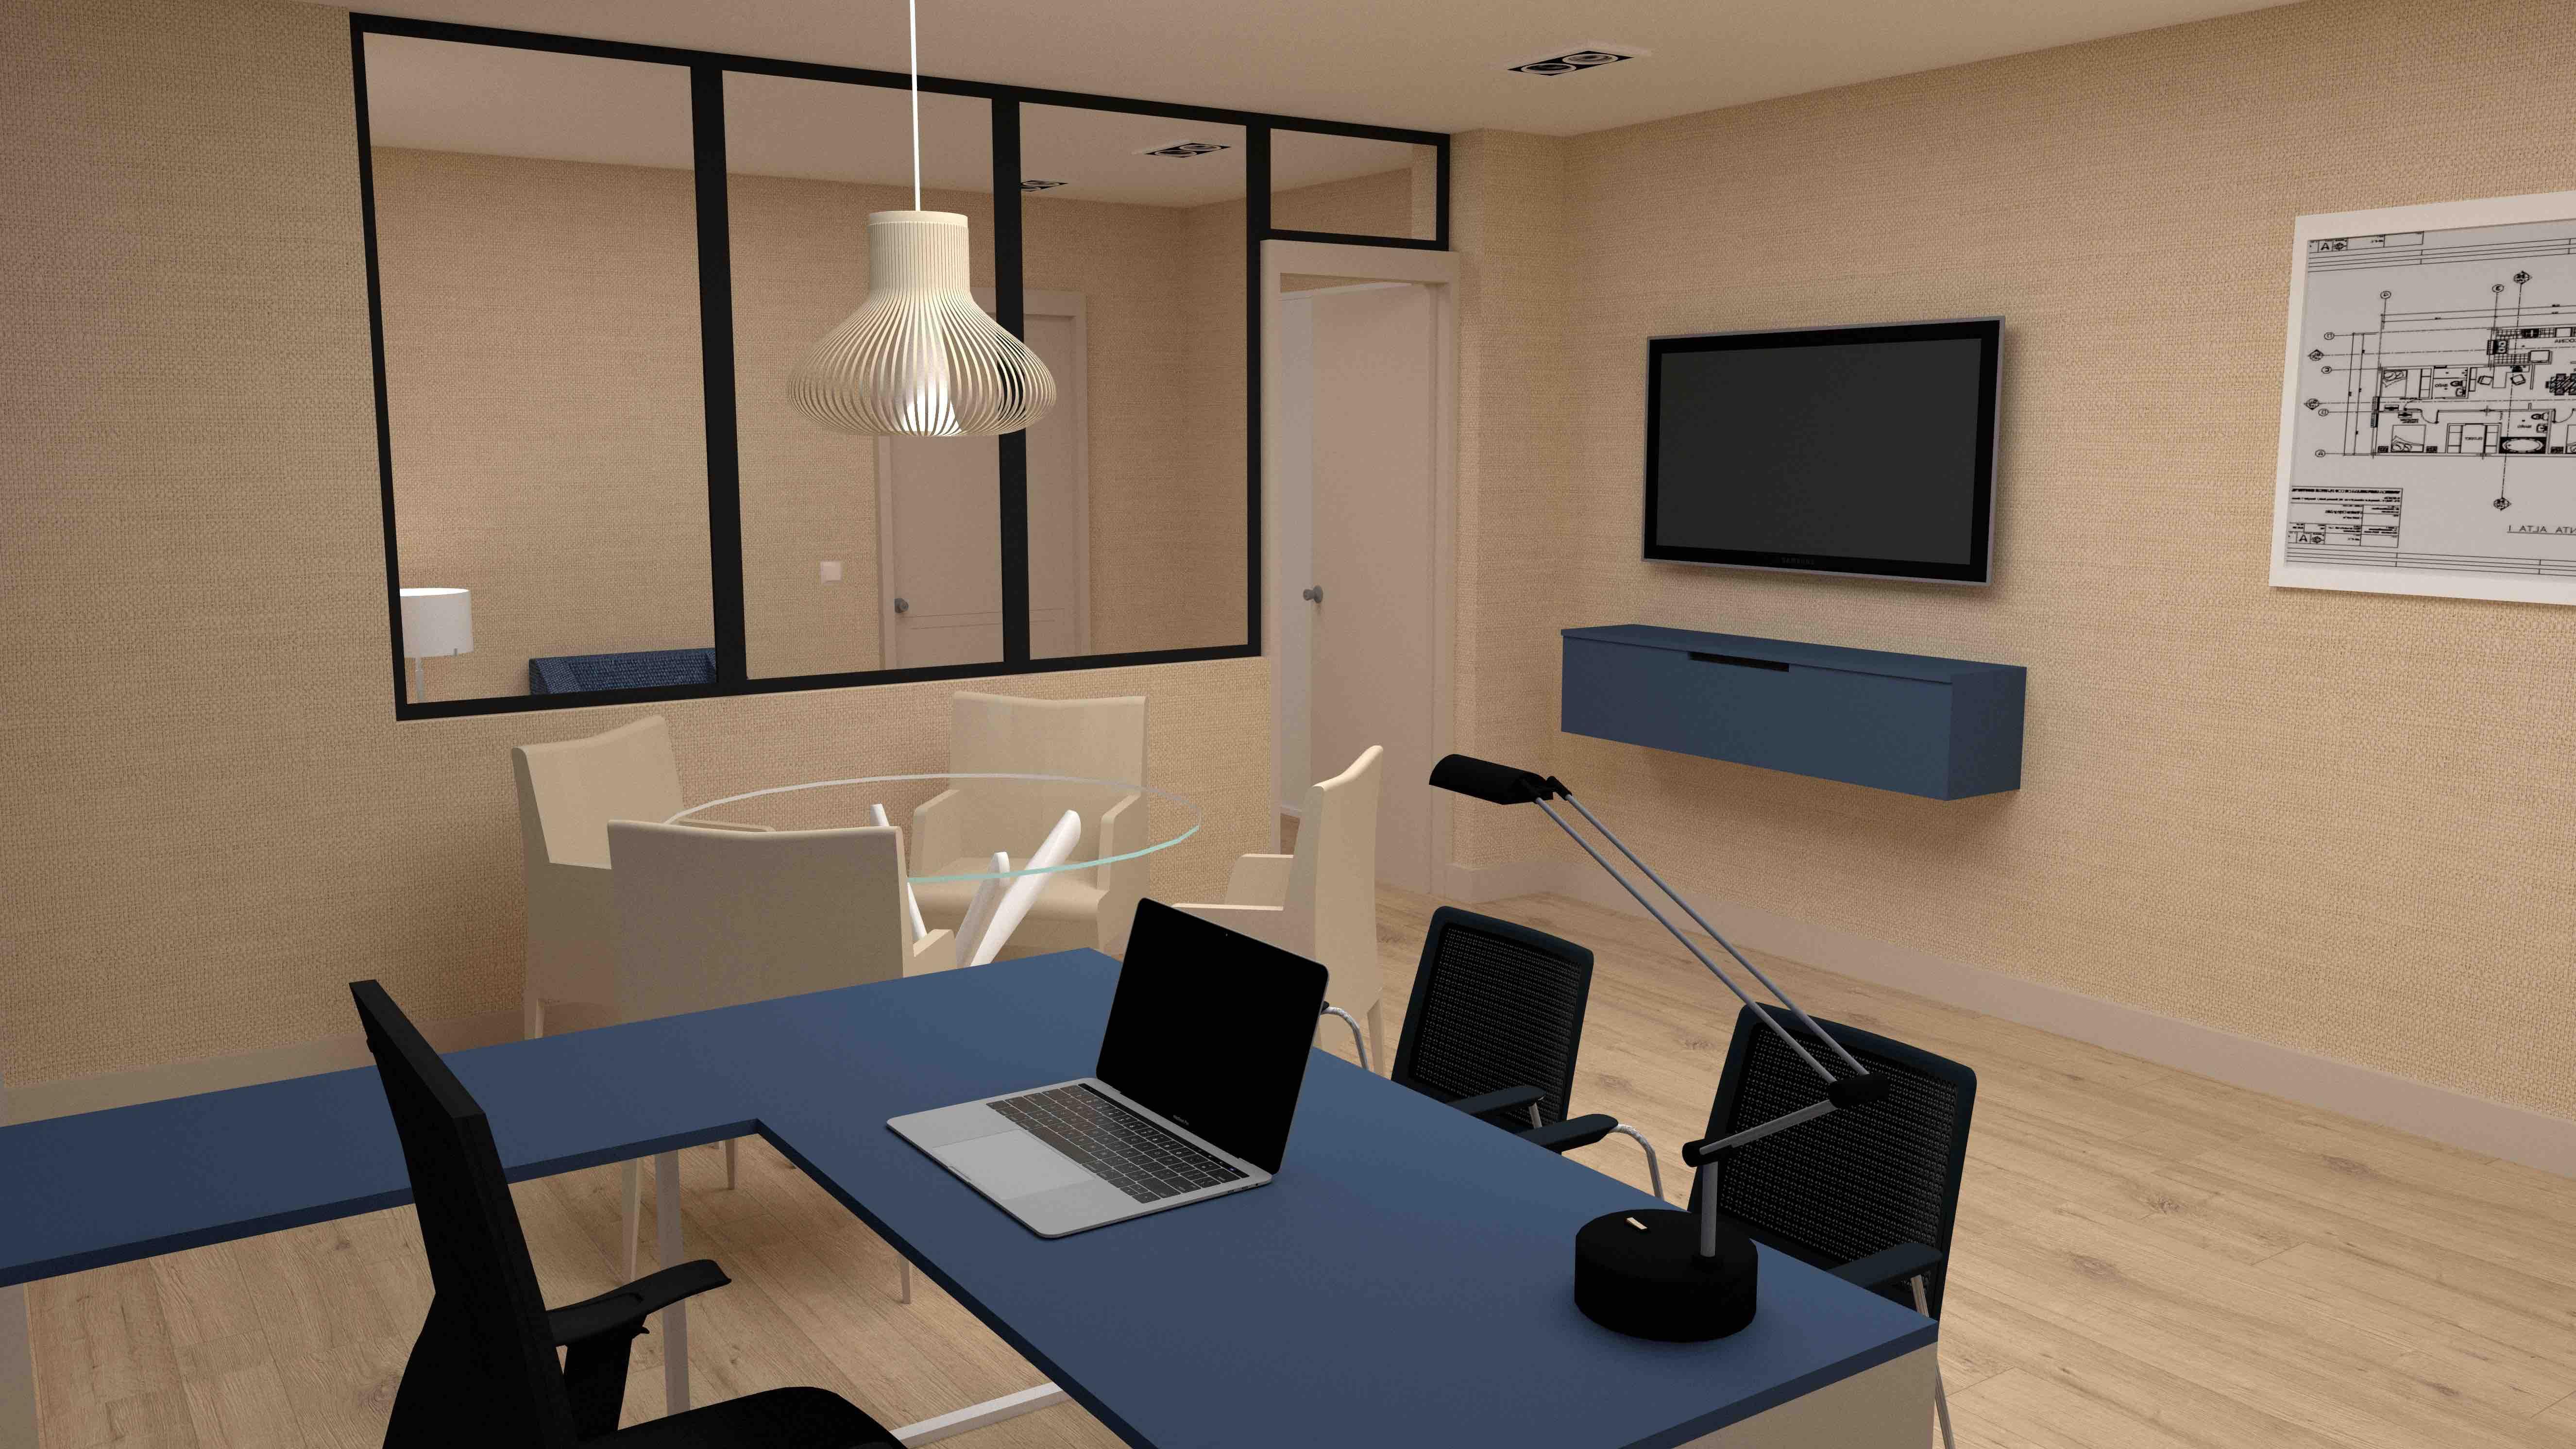 Proyecto de oficina en 3D